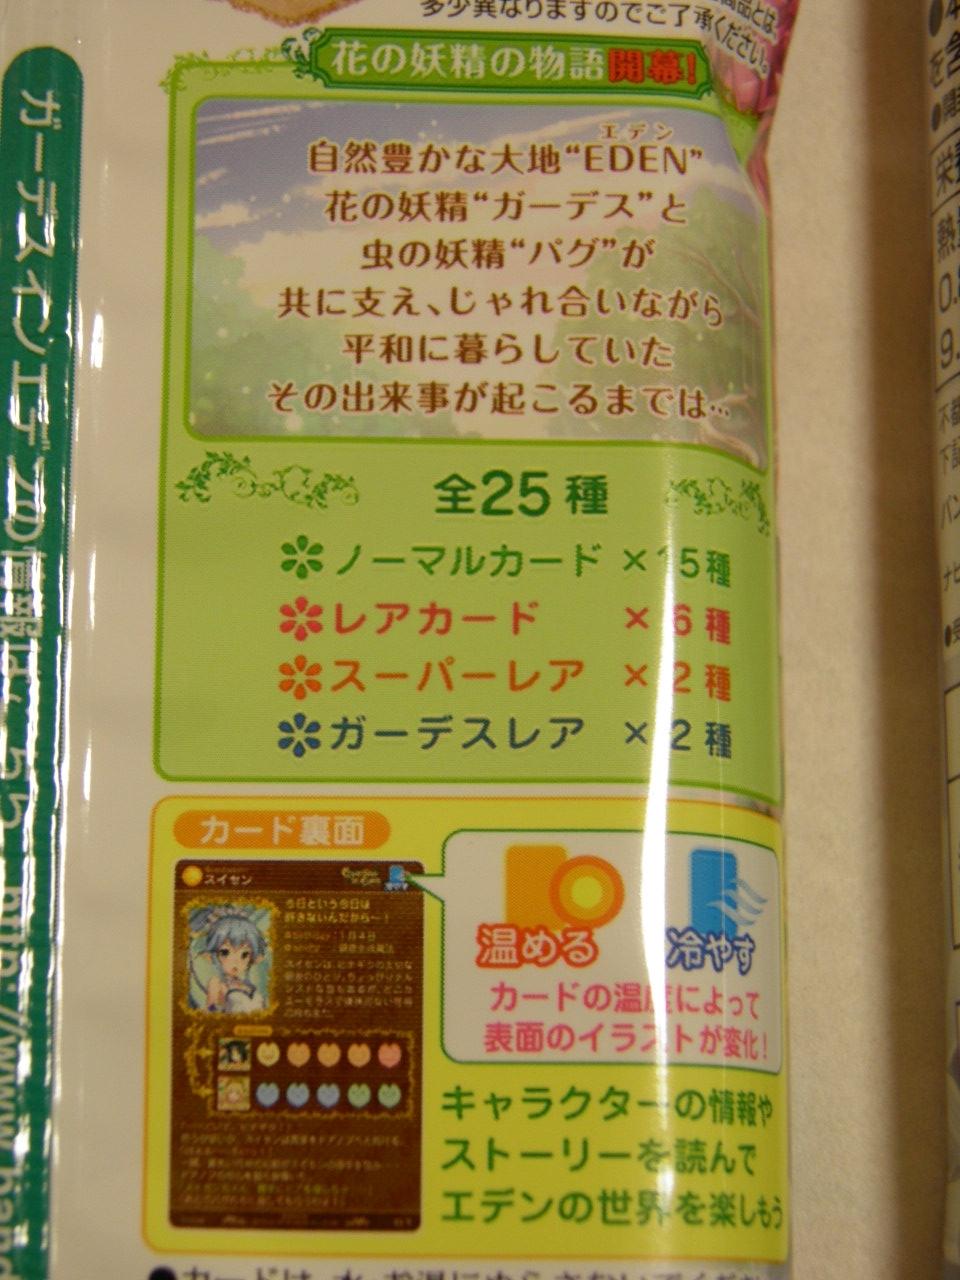 PC190245.jpg